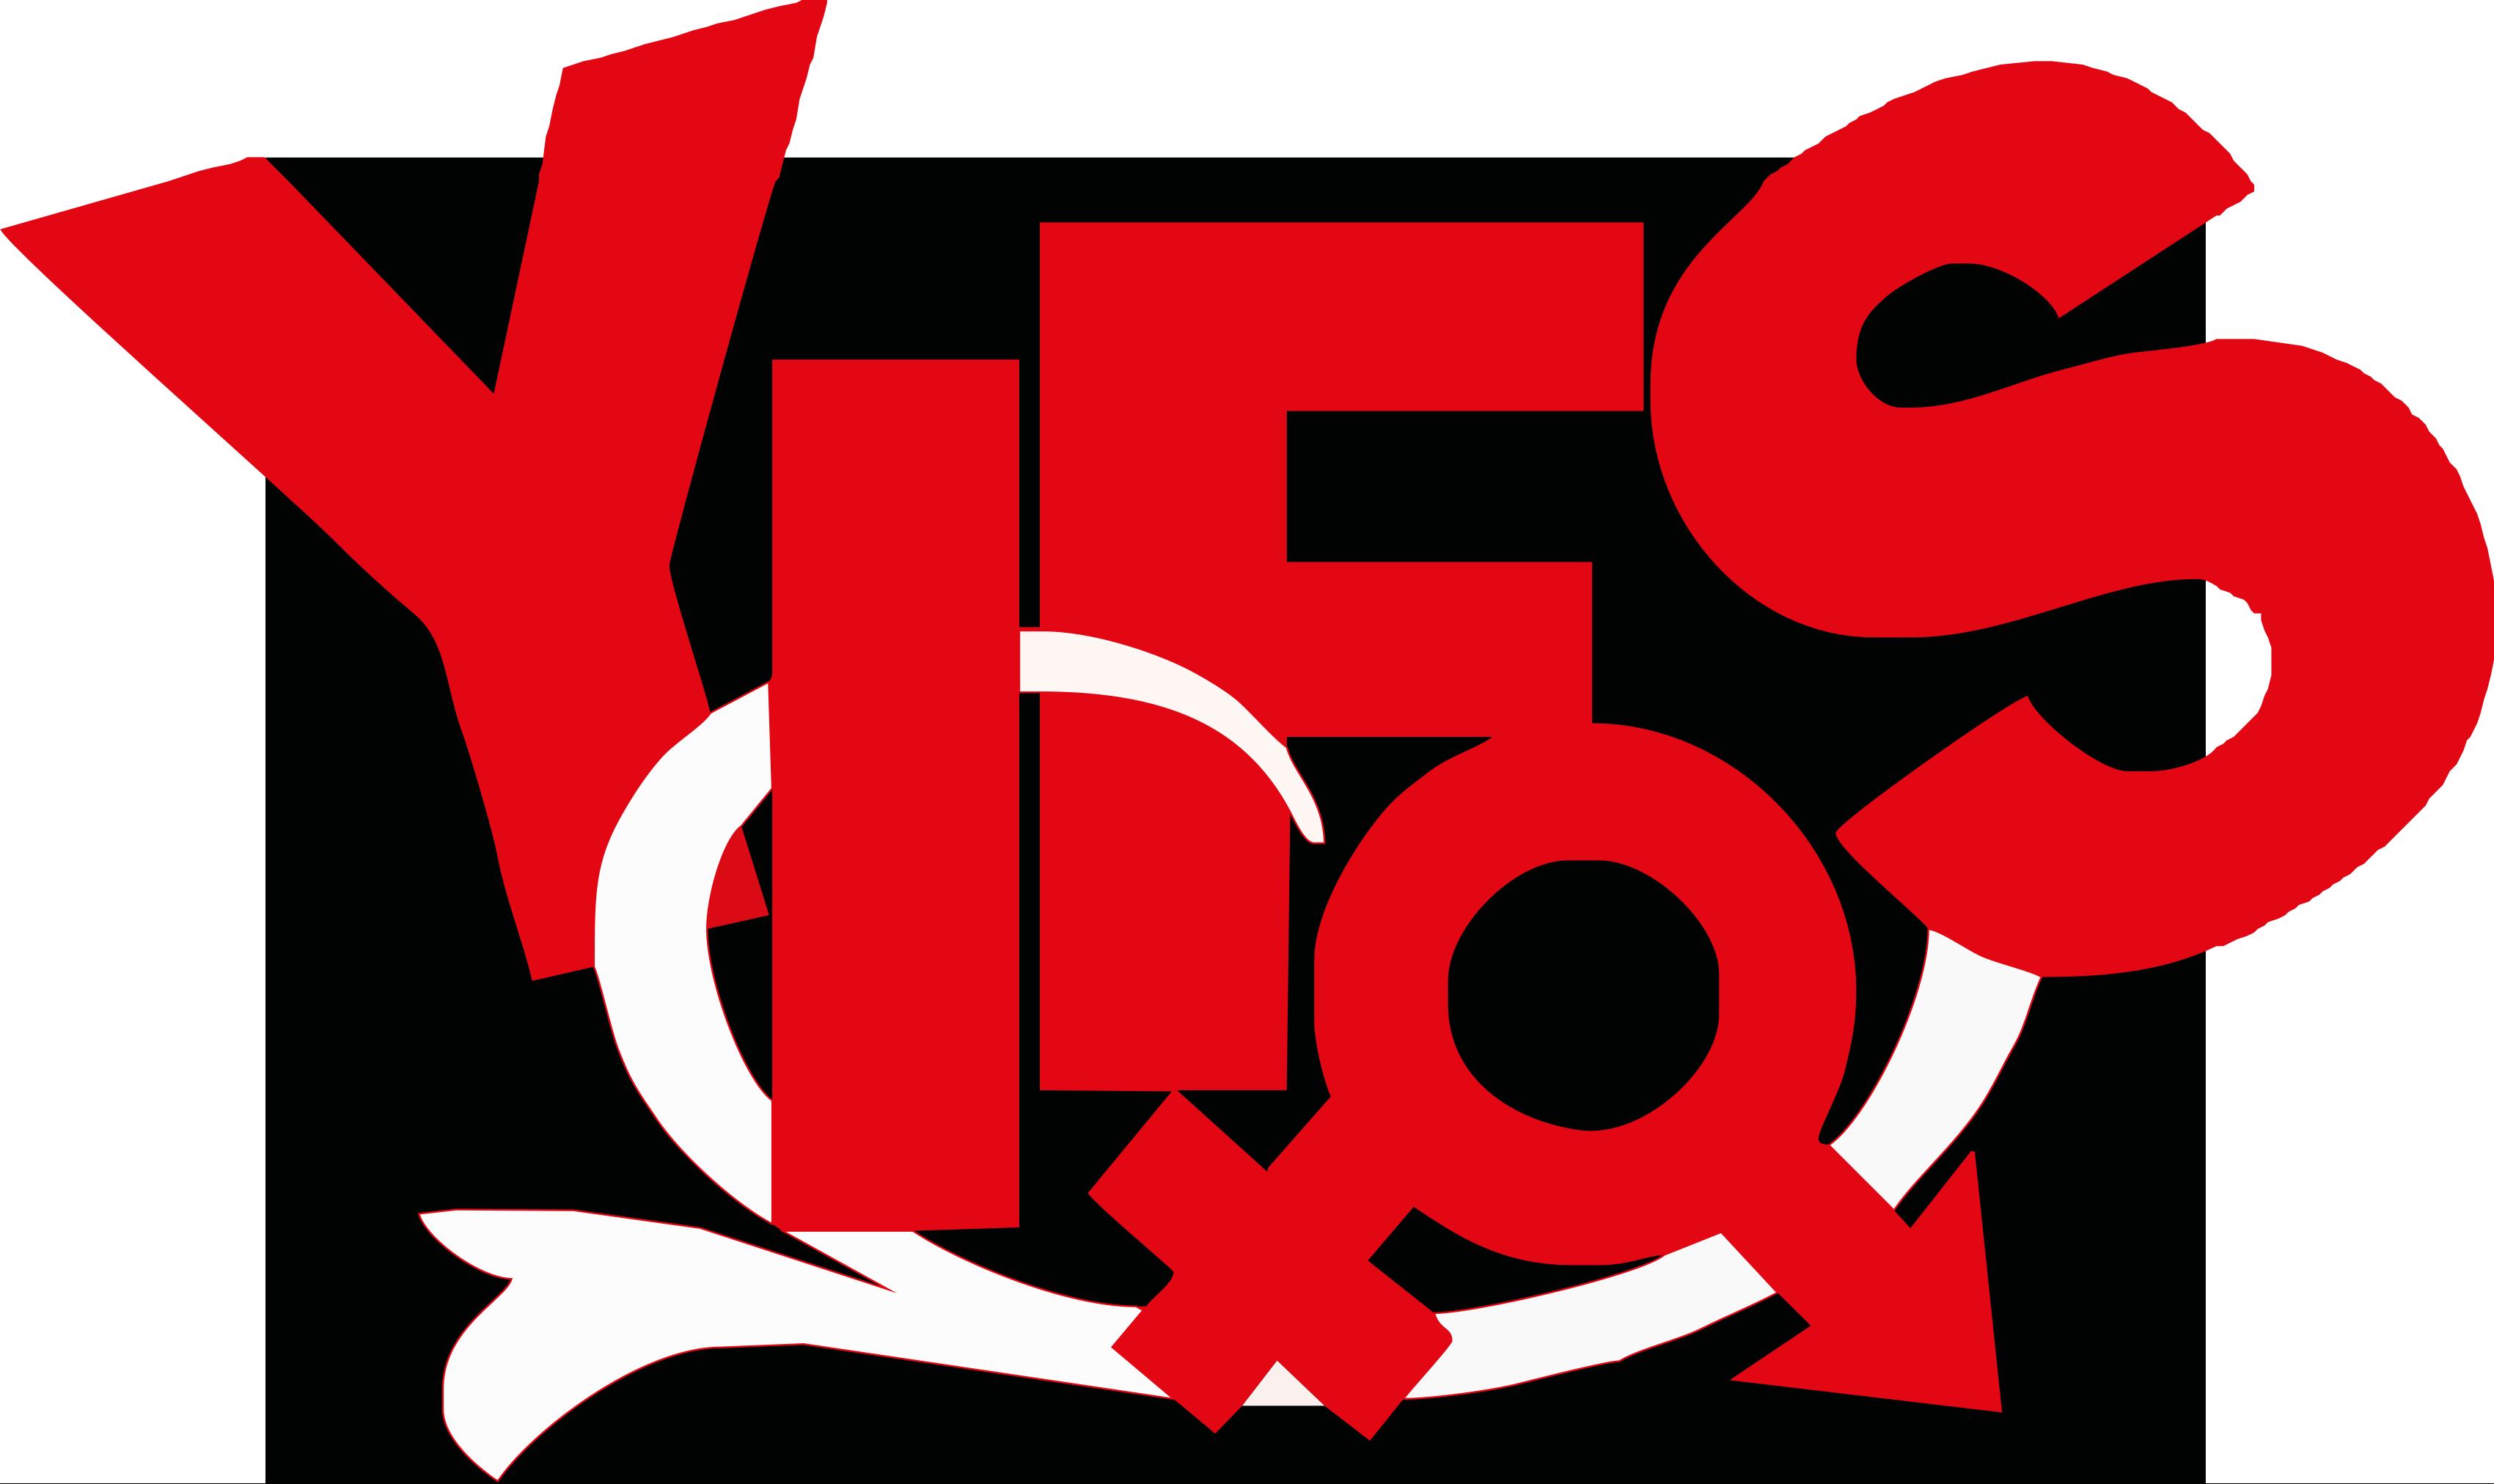 YIFoS Indonesia